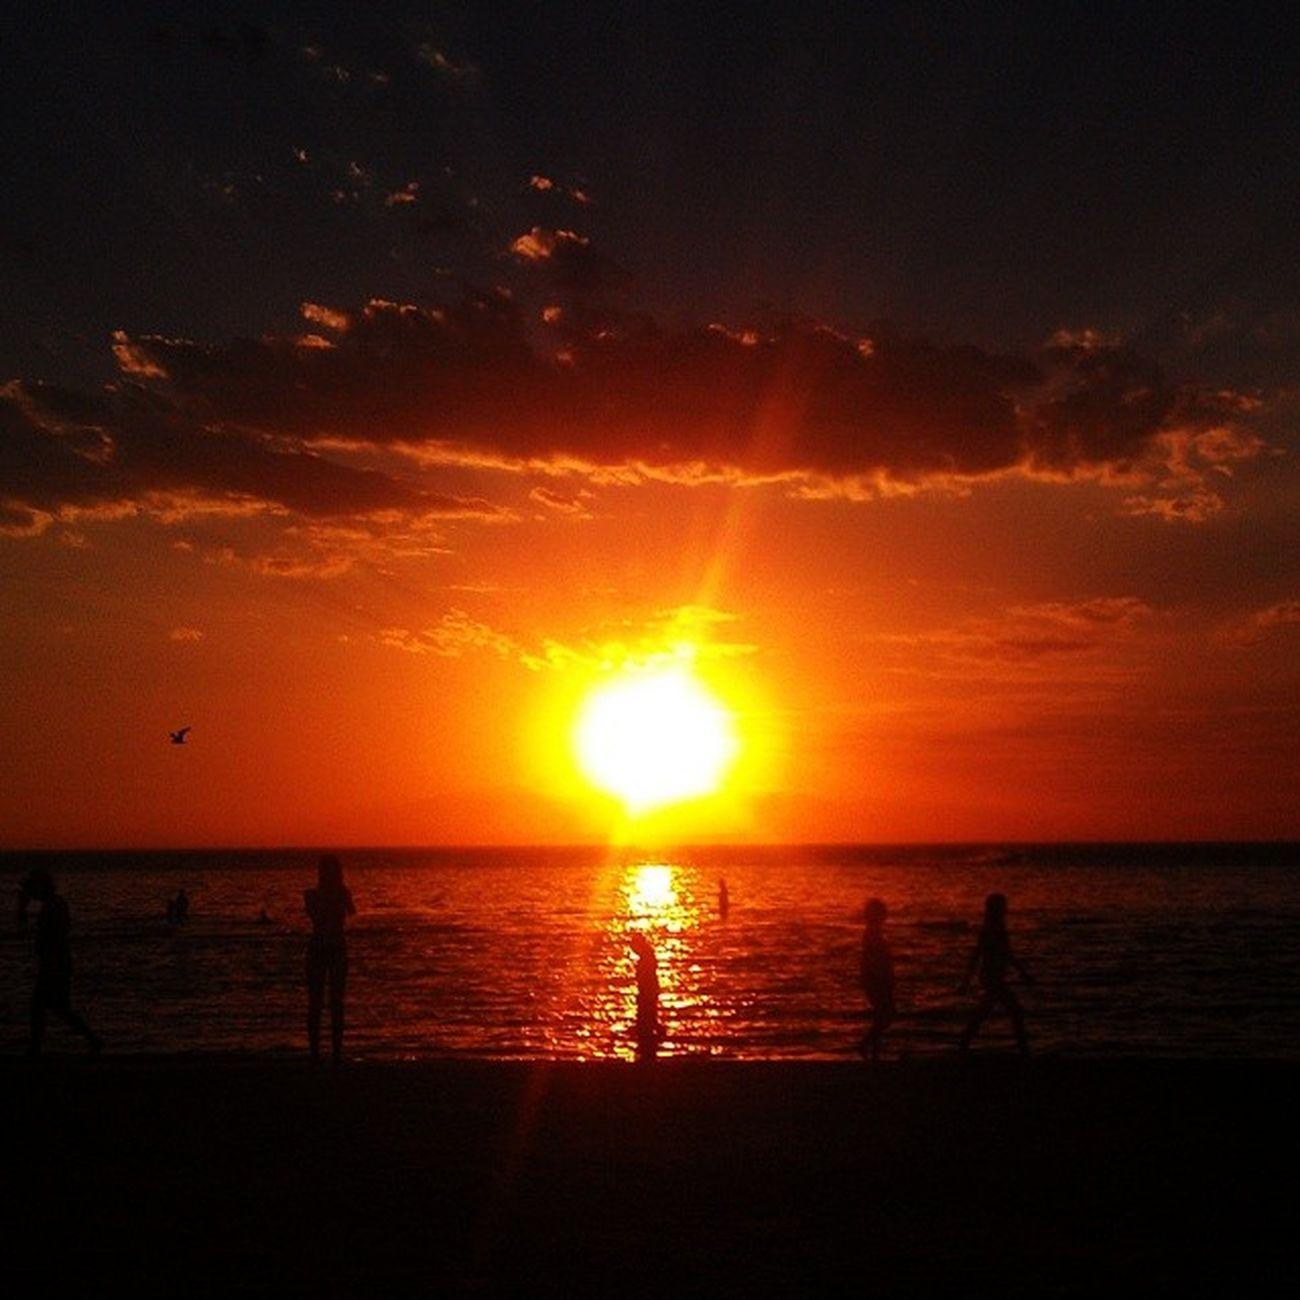 It looks.like the world is ending! Edithvale 43degrees Somanycookedlobsters Nofilter sunset melbourne seeaustralia